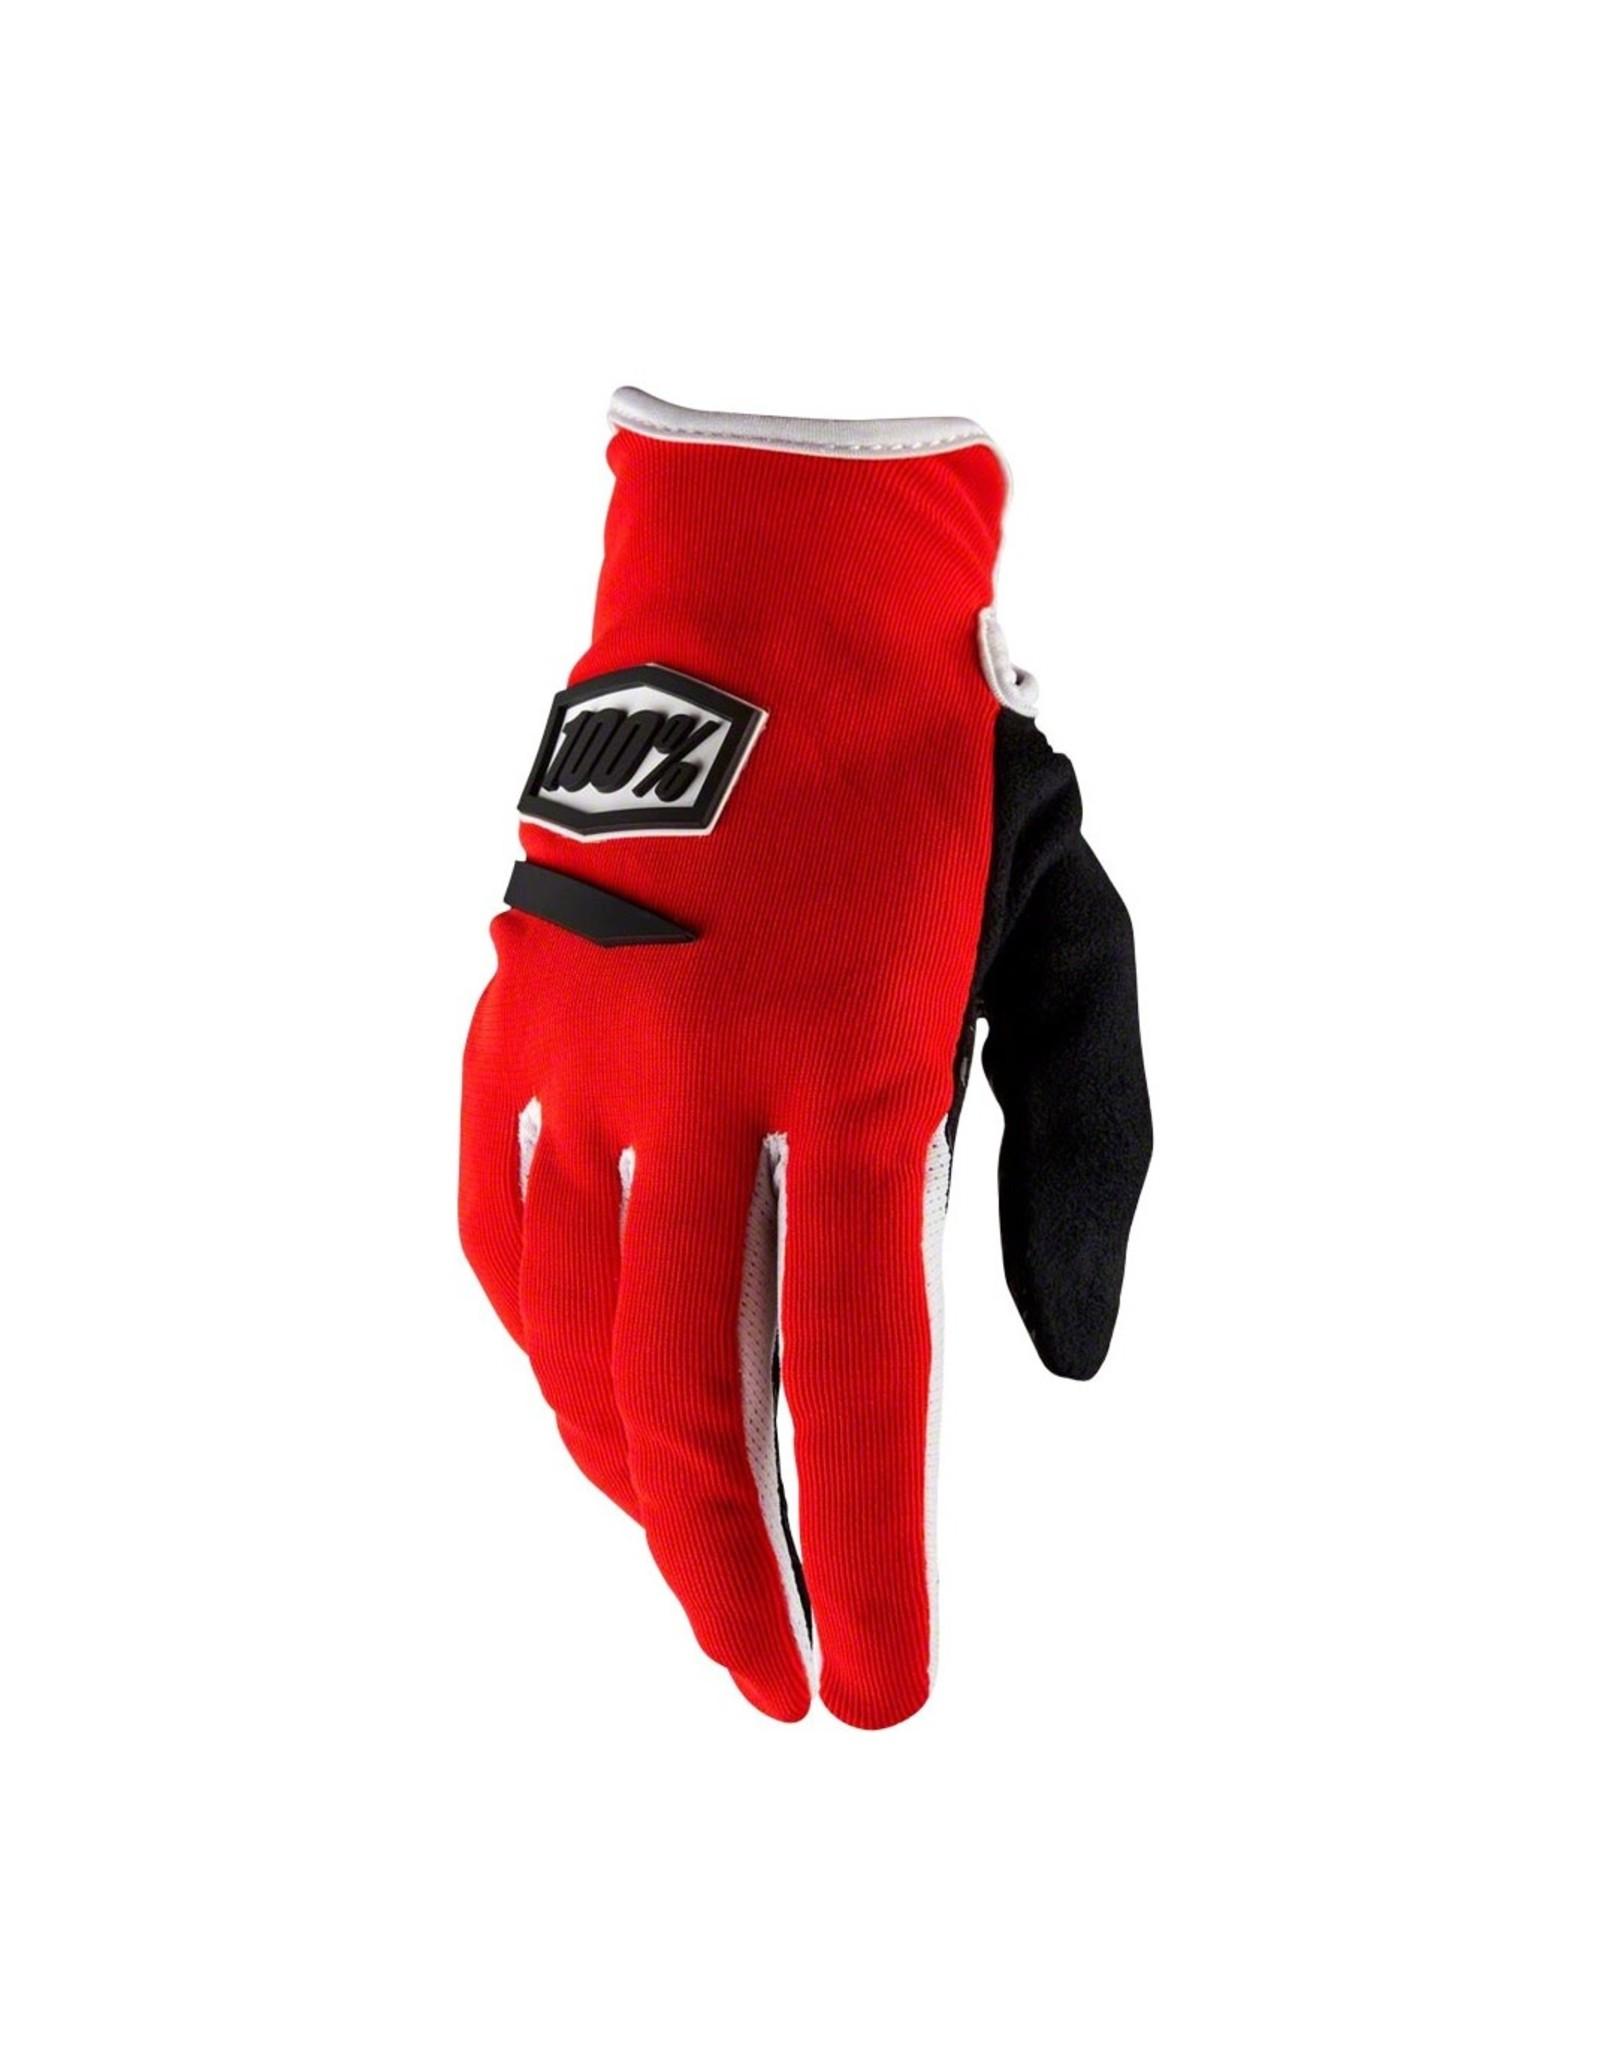 100% Women's 100% Ridecamp Gloves